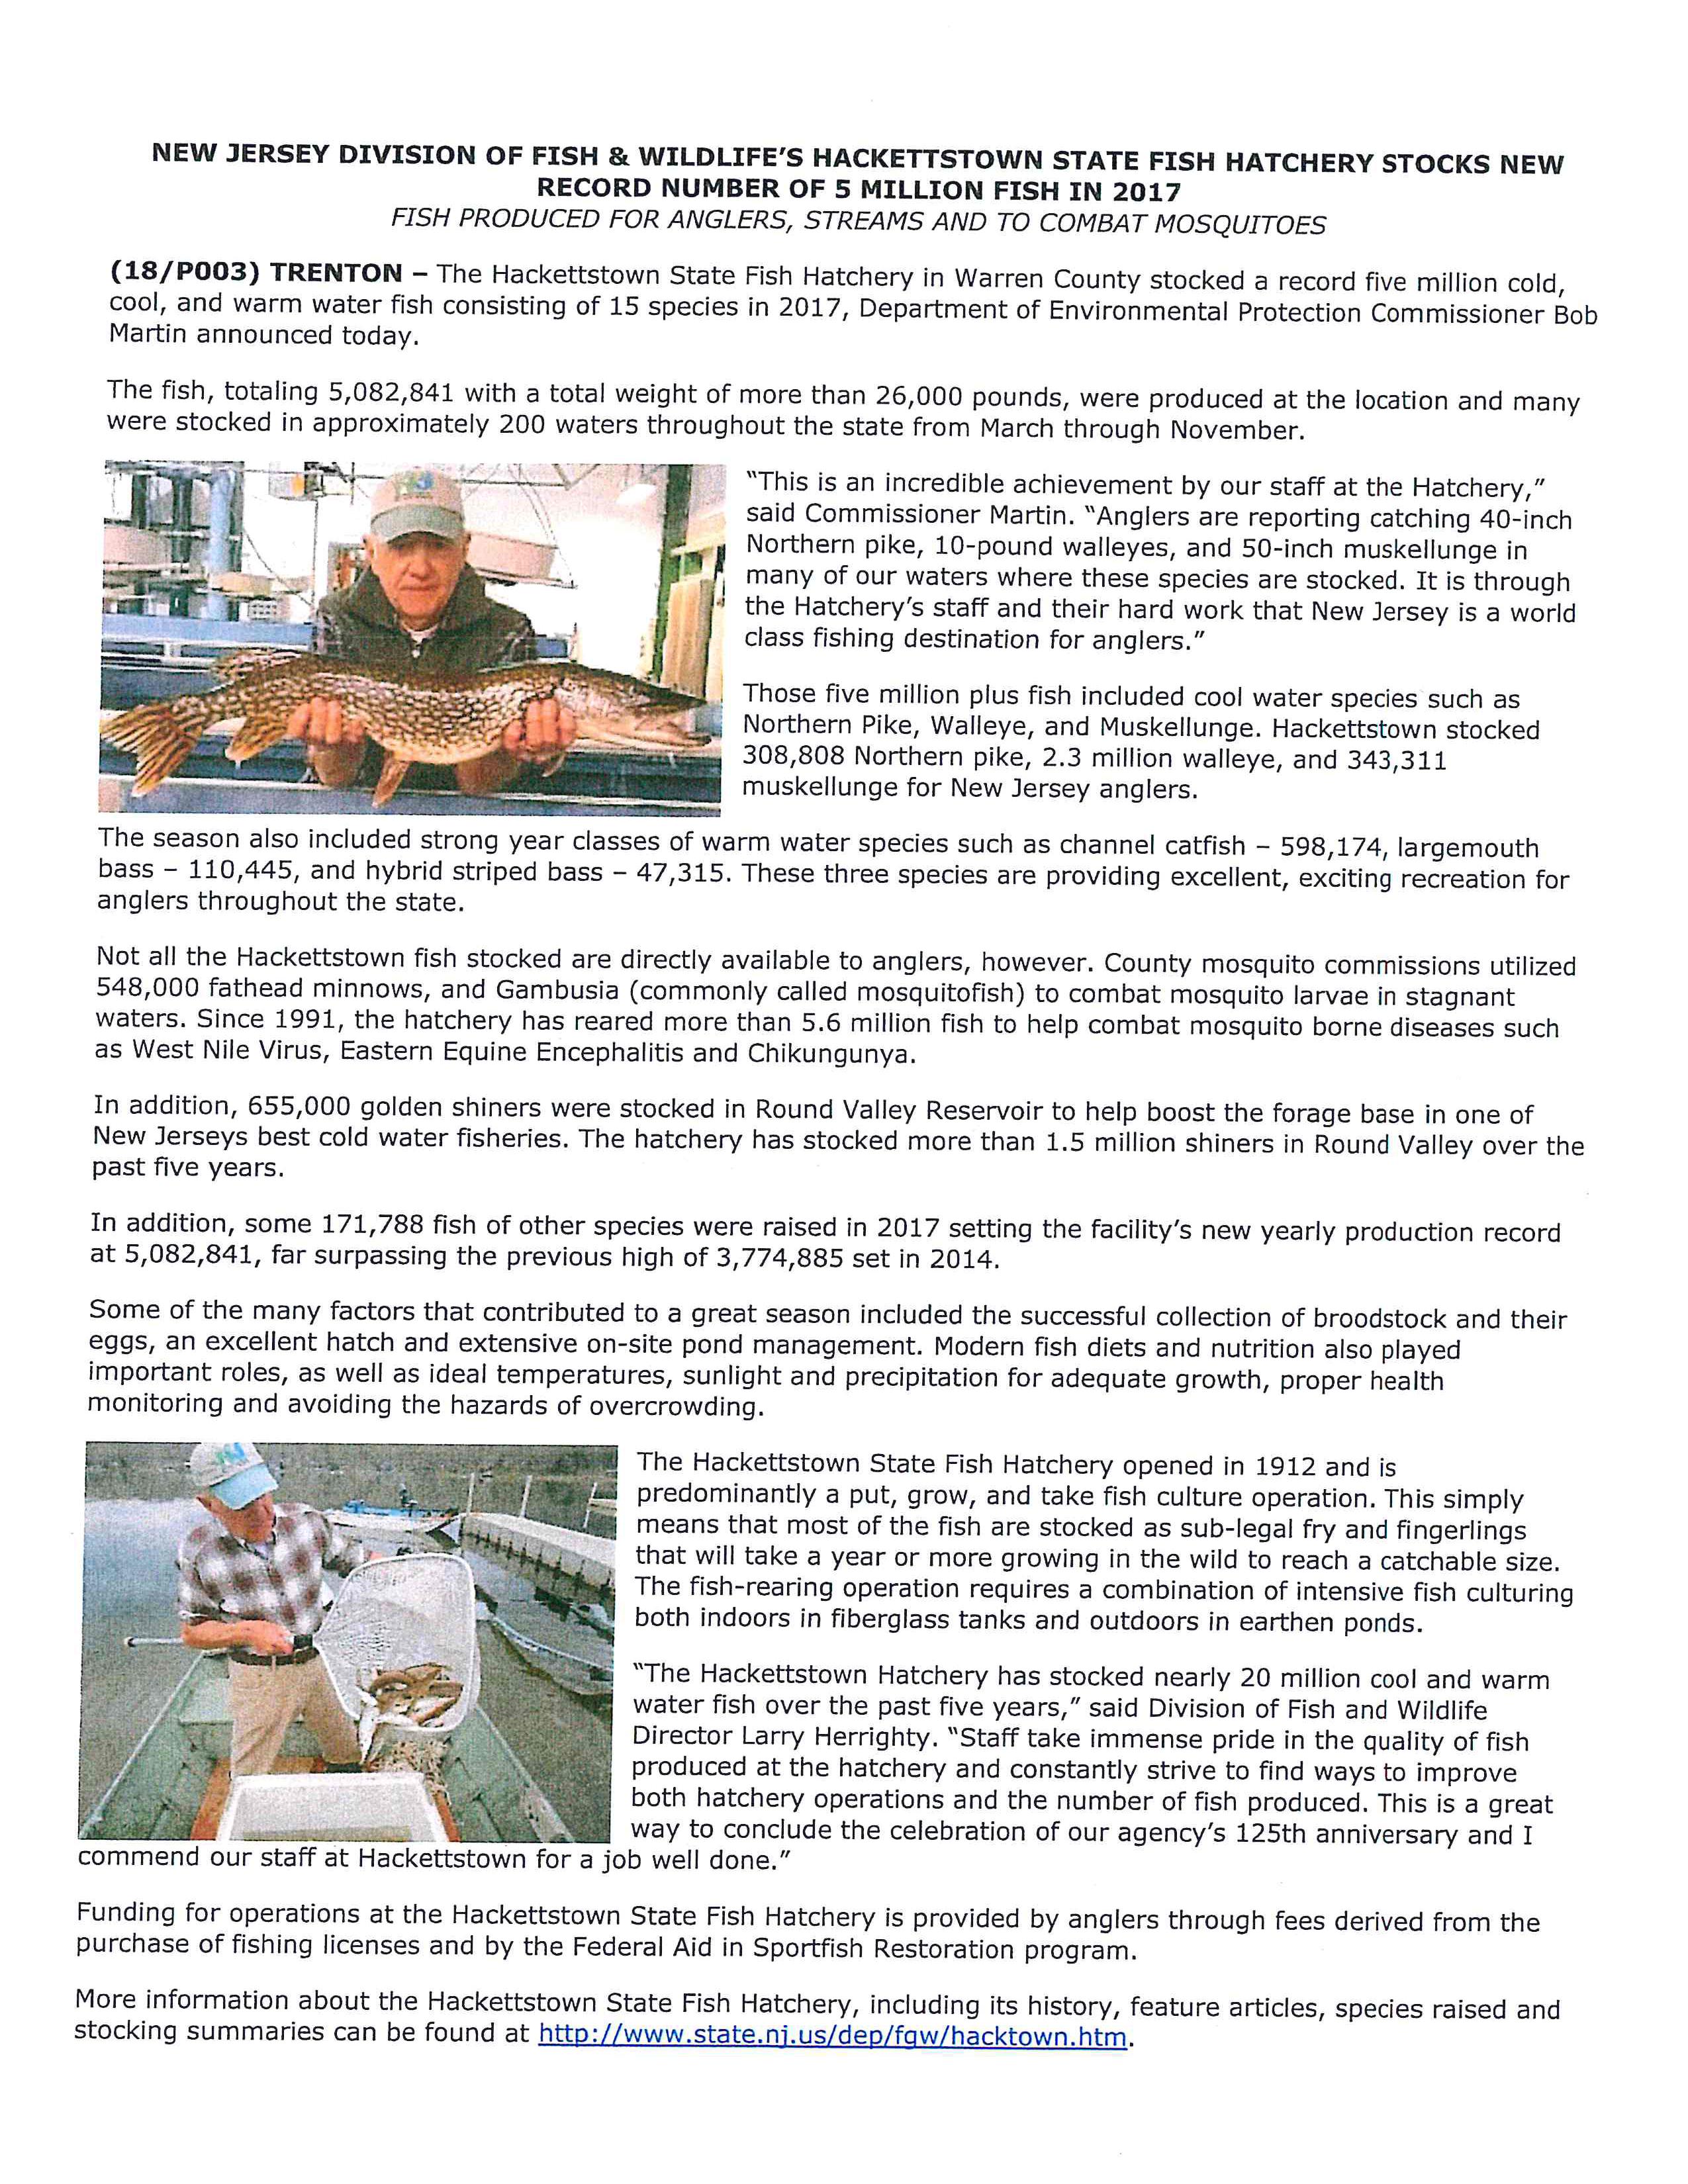 NJ Fish & Wildlife - Bordentown Township New Website